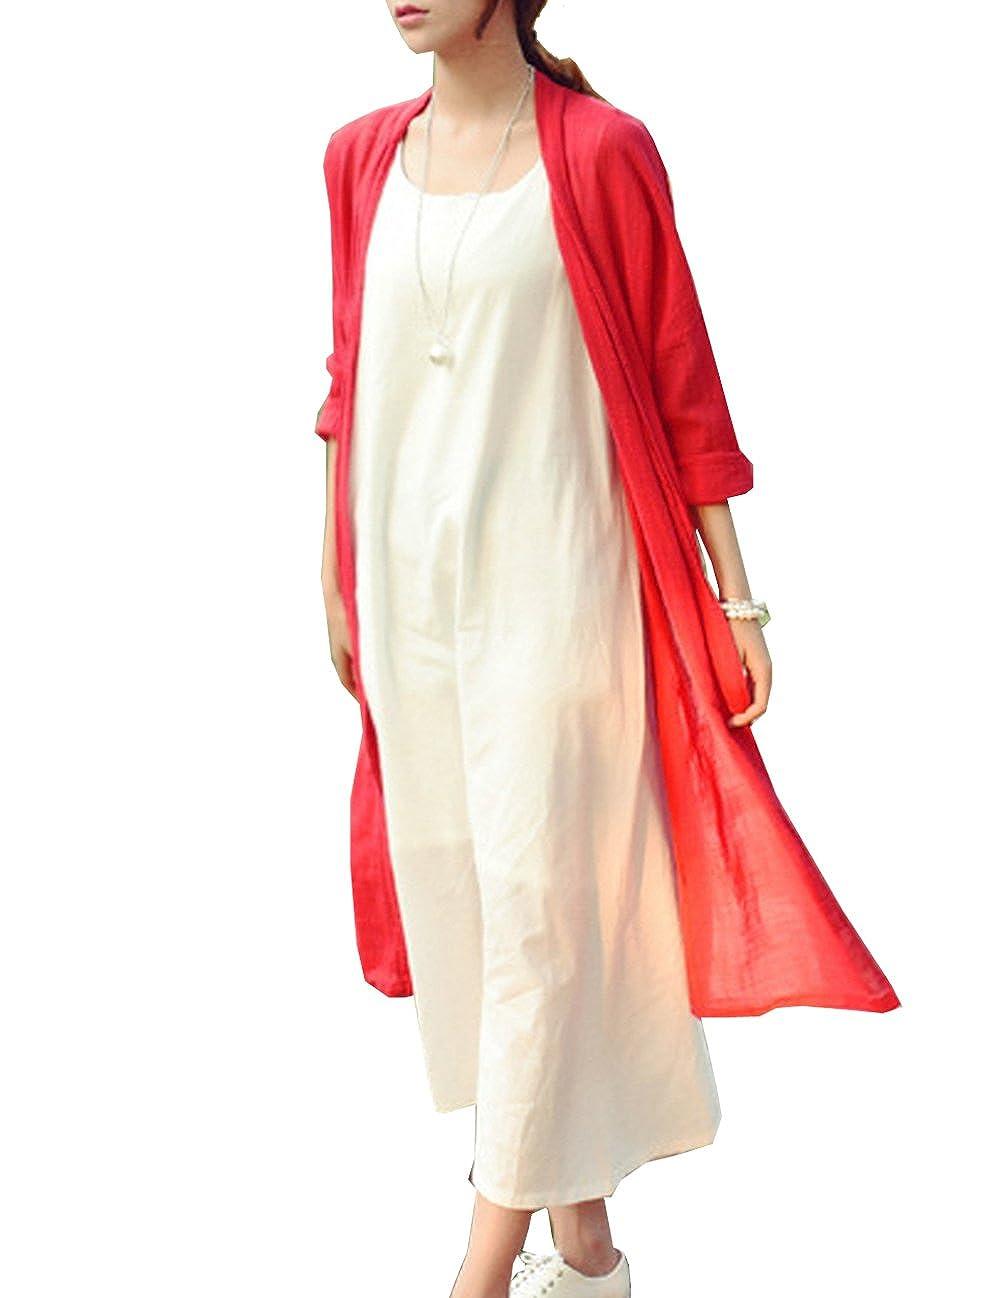 YinMei-women Niaona Womens Summer Petite Linen Collarless Comfort Lightweight No Buttons Long Cardigan